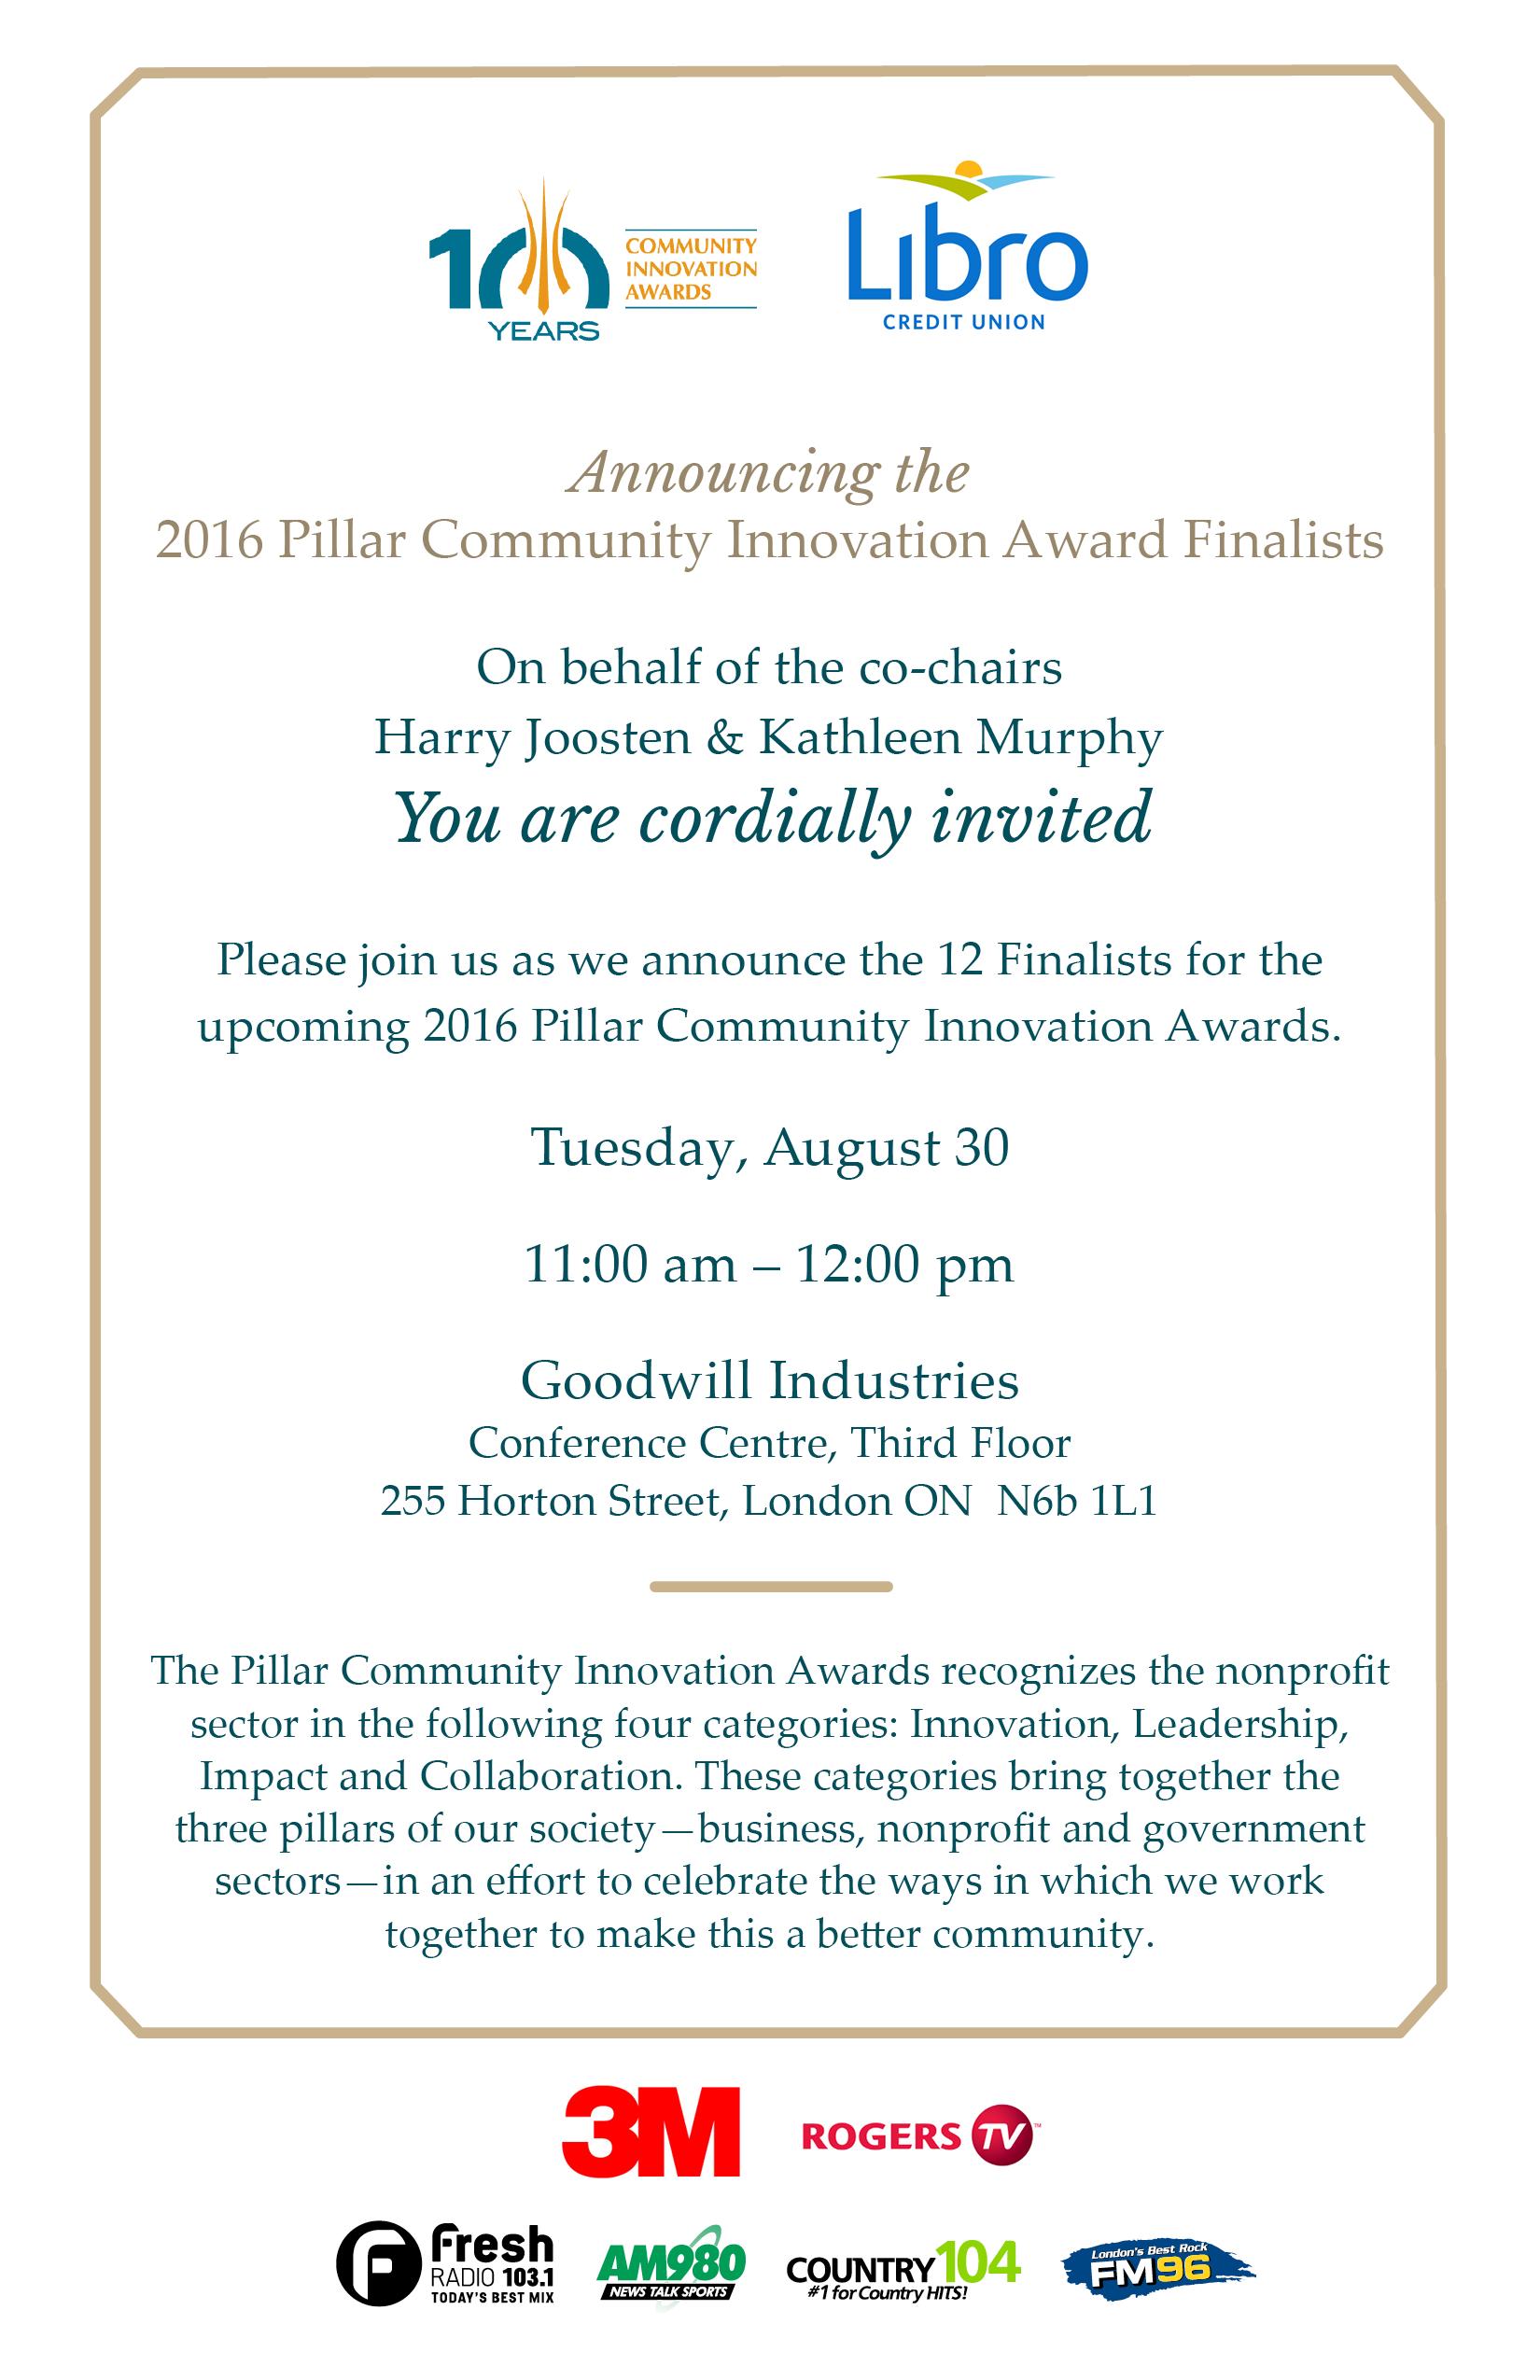 Community Innovation Award Finalists invitation